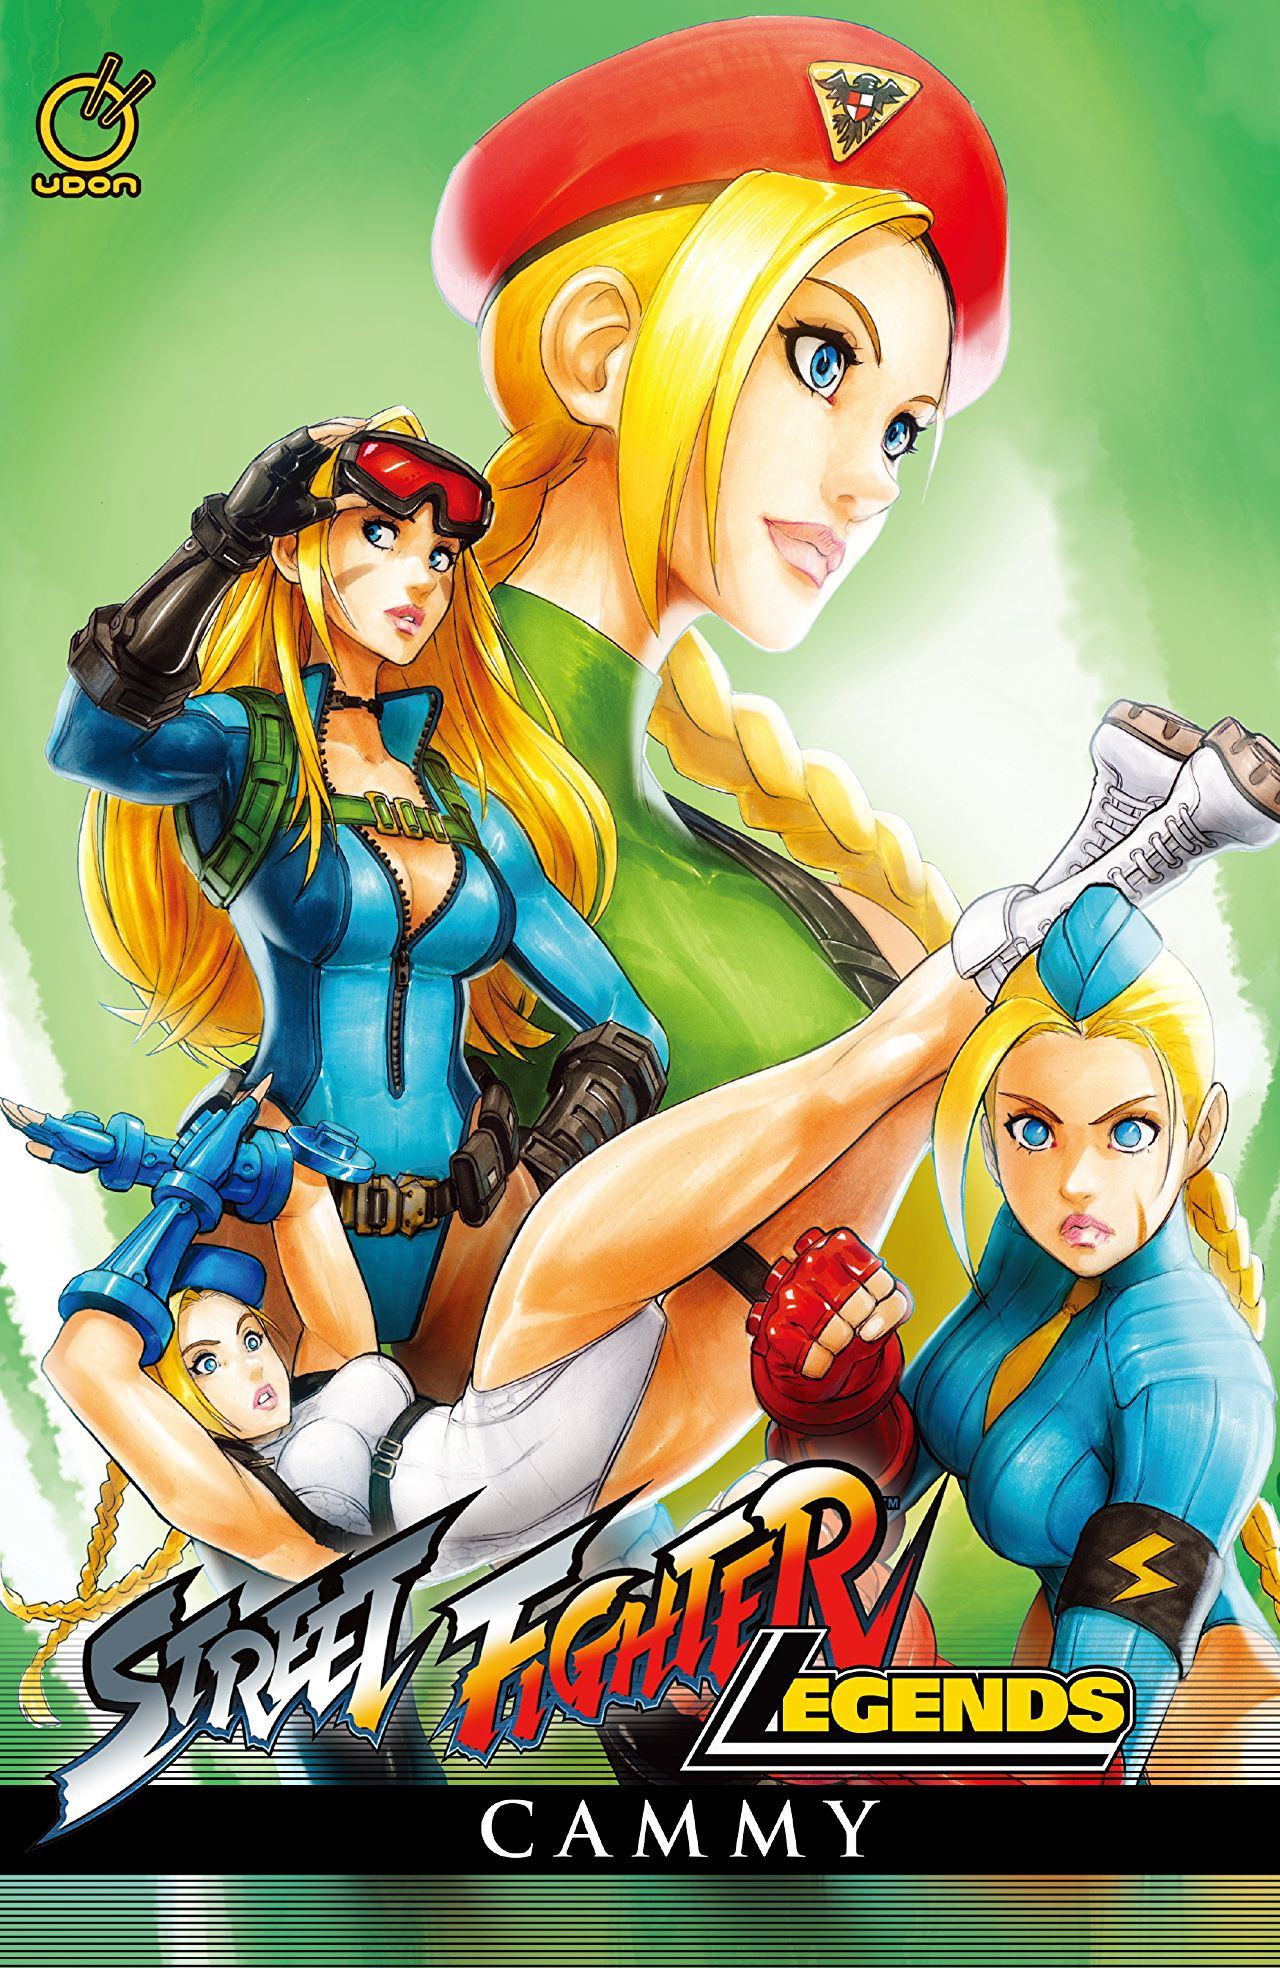 Street Fighter Legends: Cammy